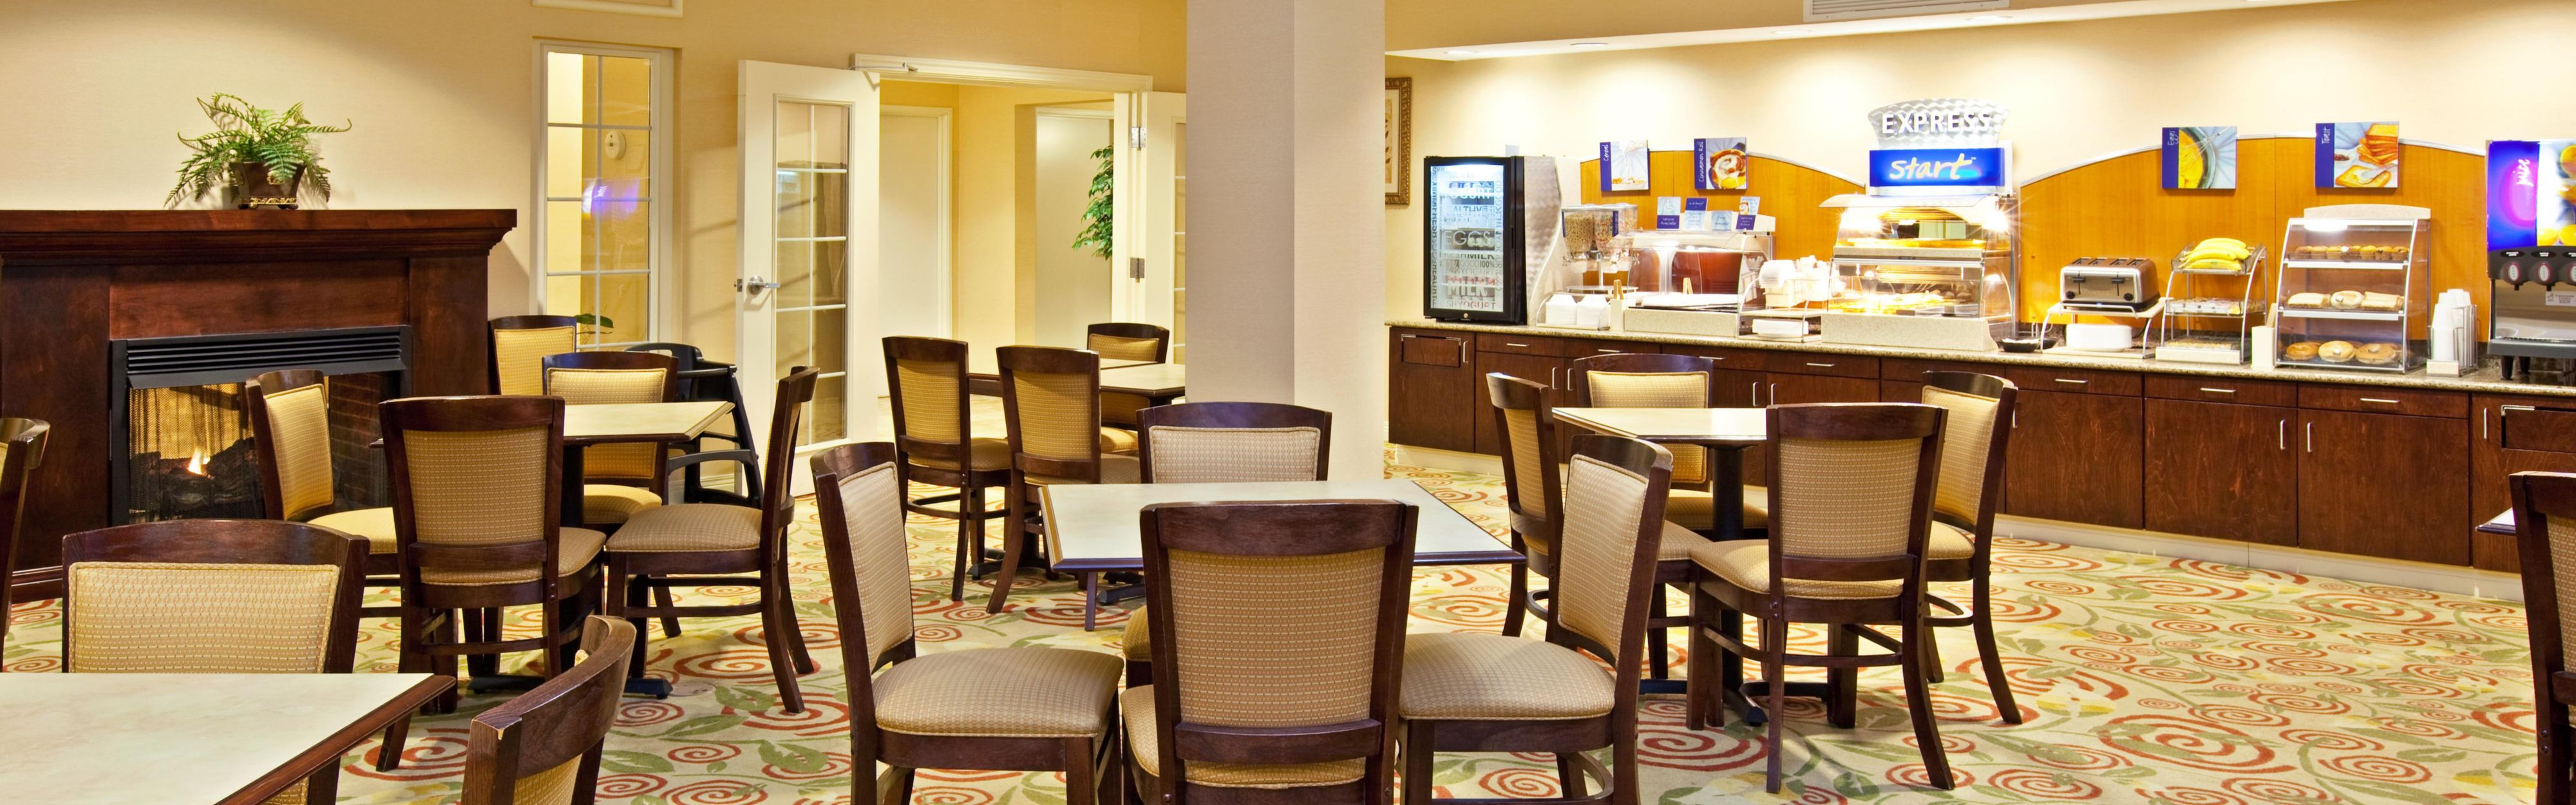 Hotels Motels In Jasper Indiana